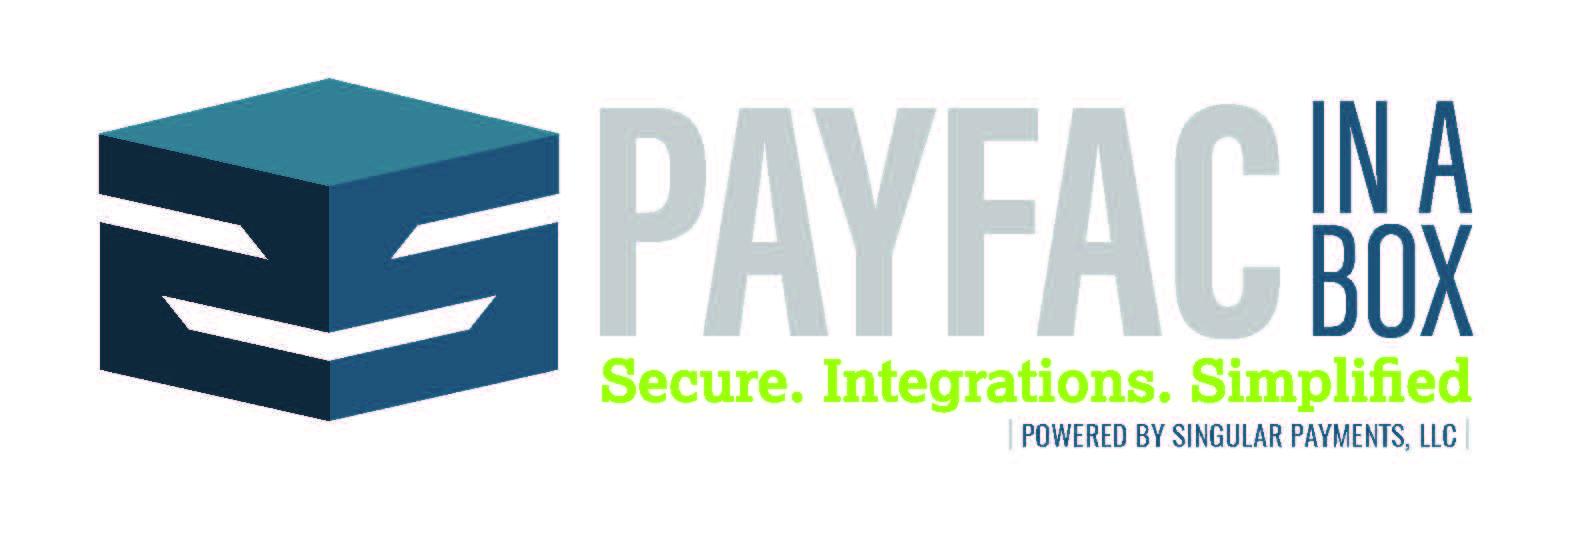 PayfacinaBoc_logo_FINAL_v2.jpg